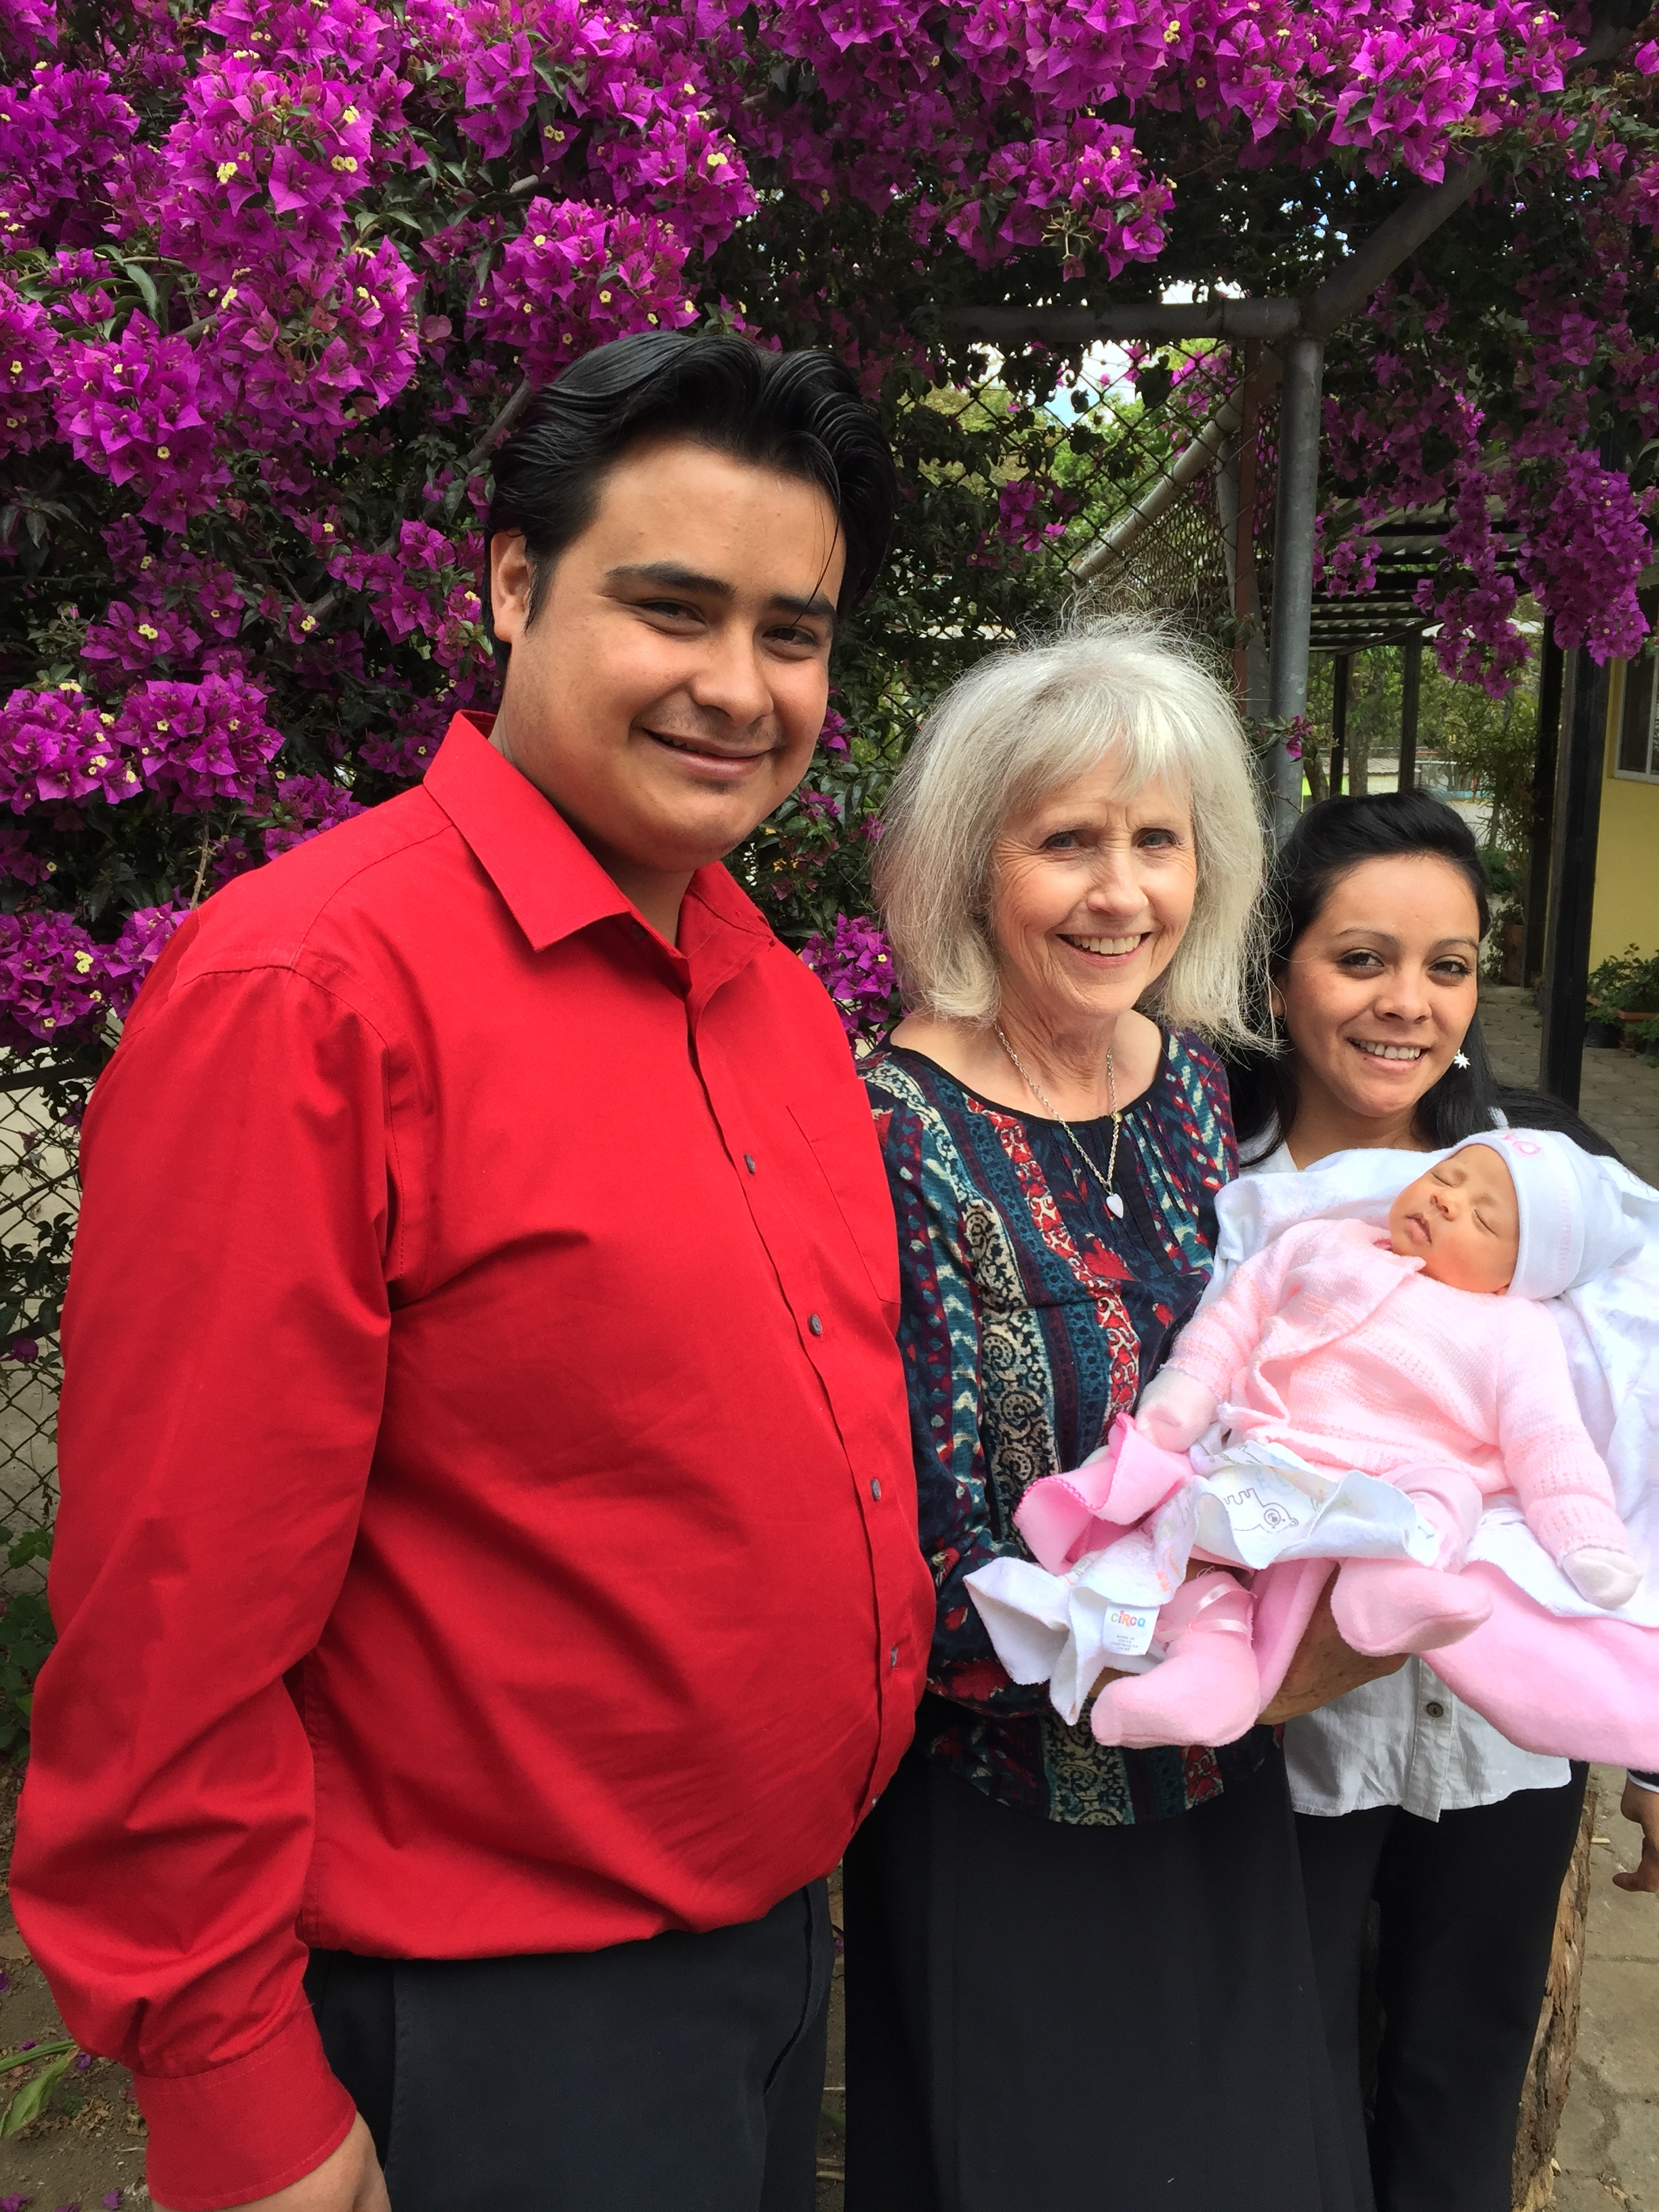 Mario, Mariella and Grandma with baby Emily.